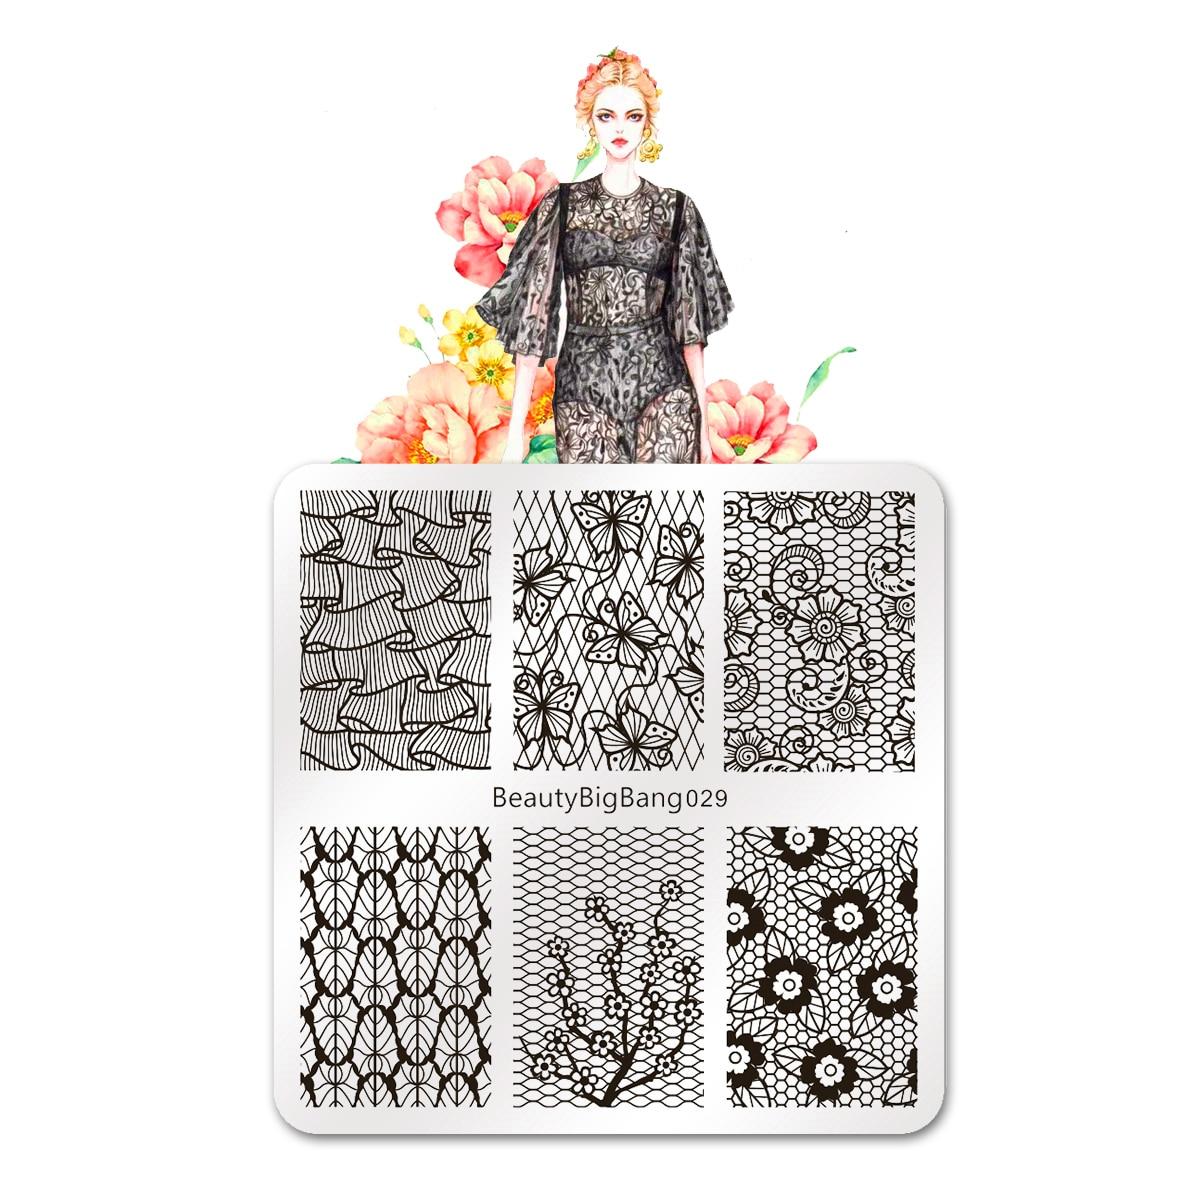 beautybigbang prego stamping placas beleza laco borboleta deixa imagem 6cm vintage de aco inoxidavel modelo de